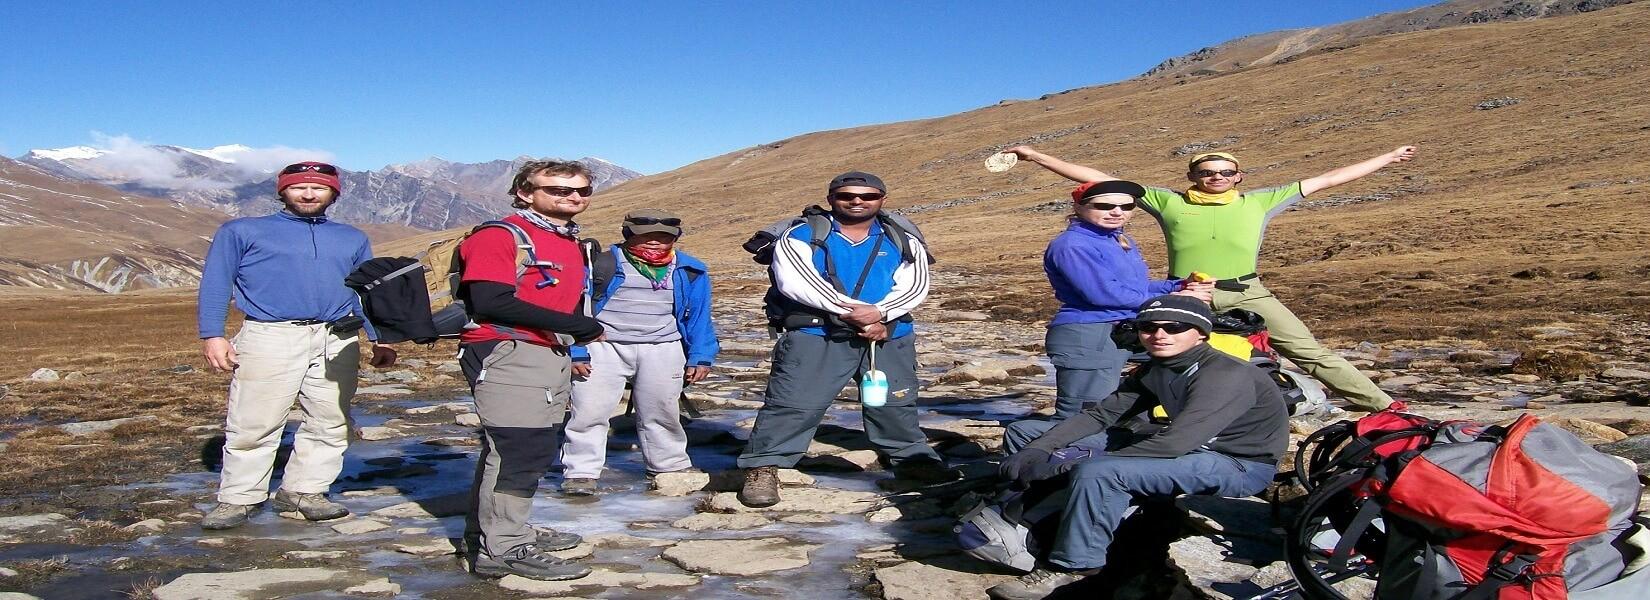 Wilderness Trekking in Nepal